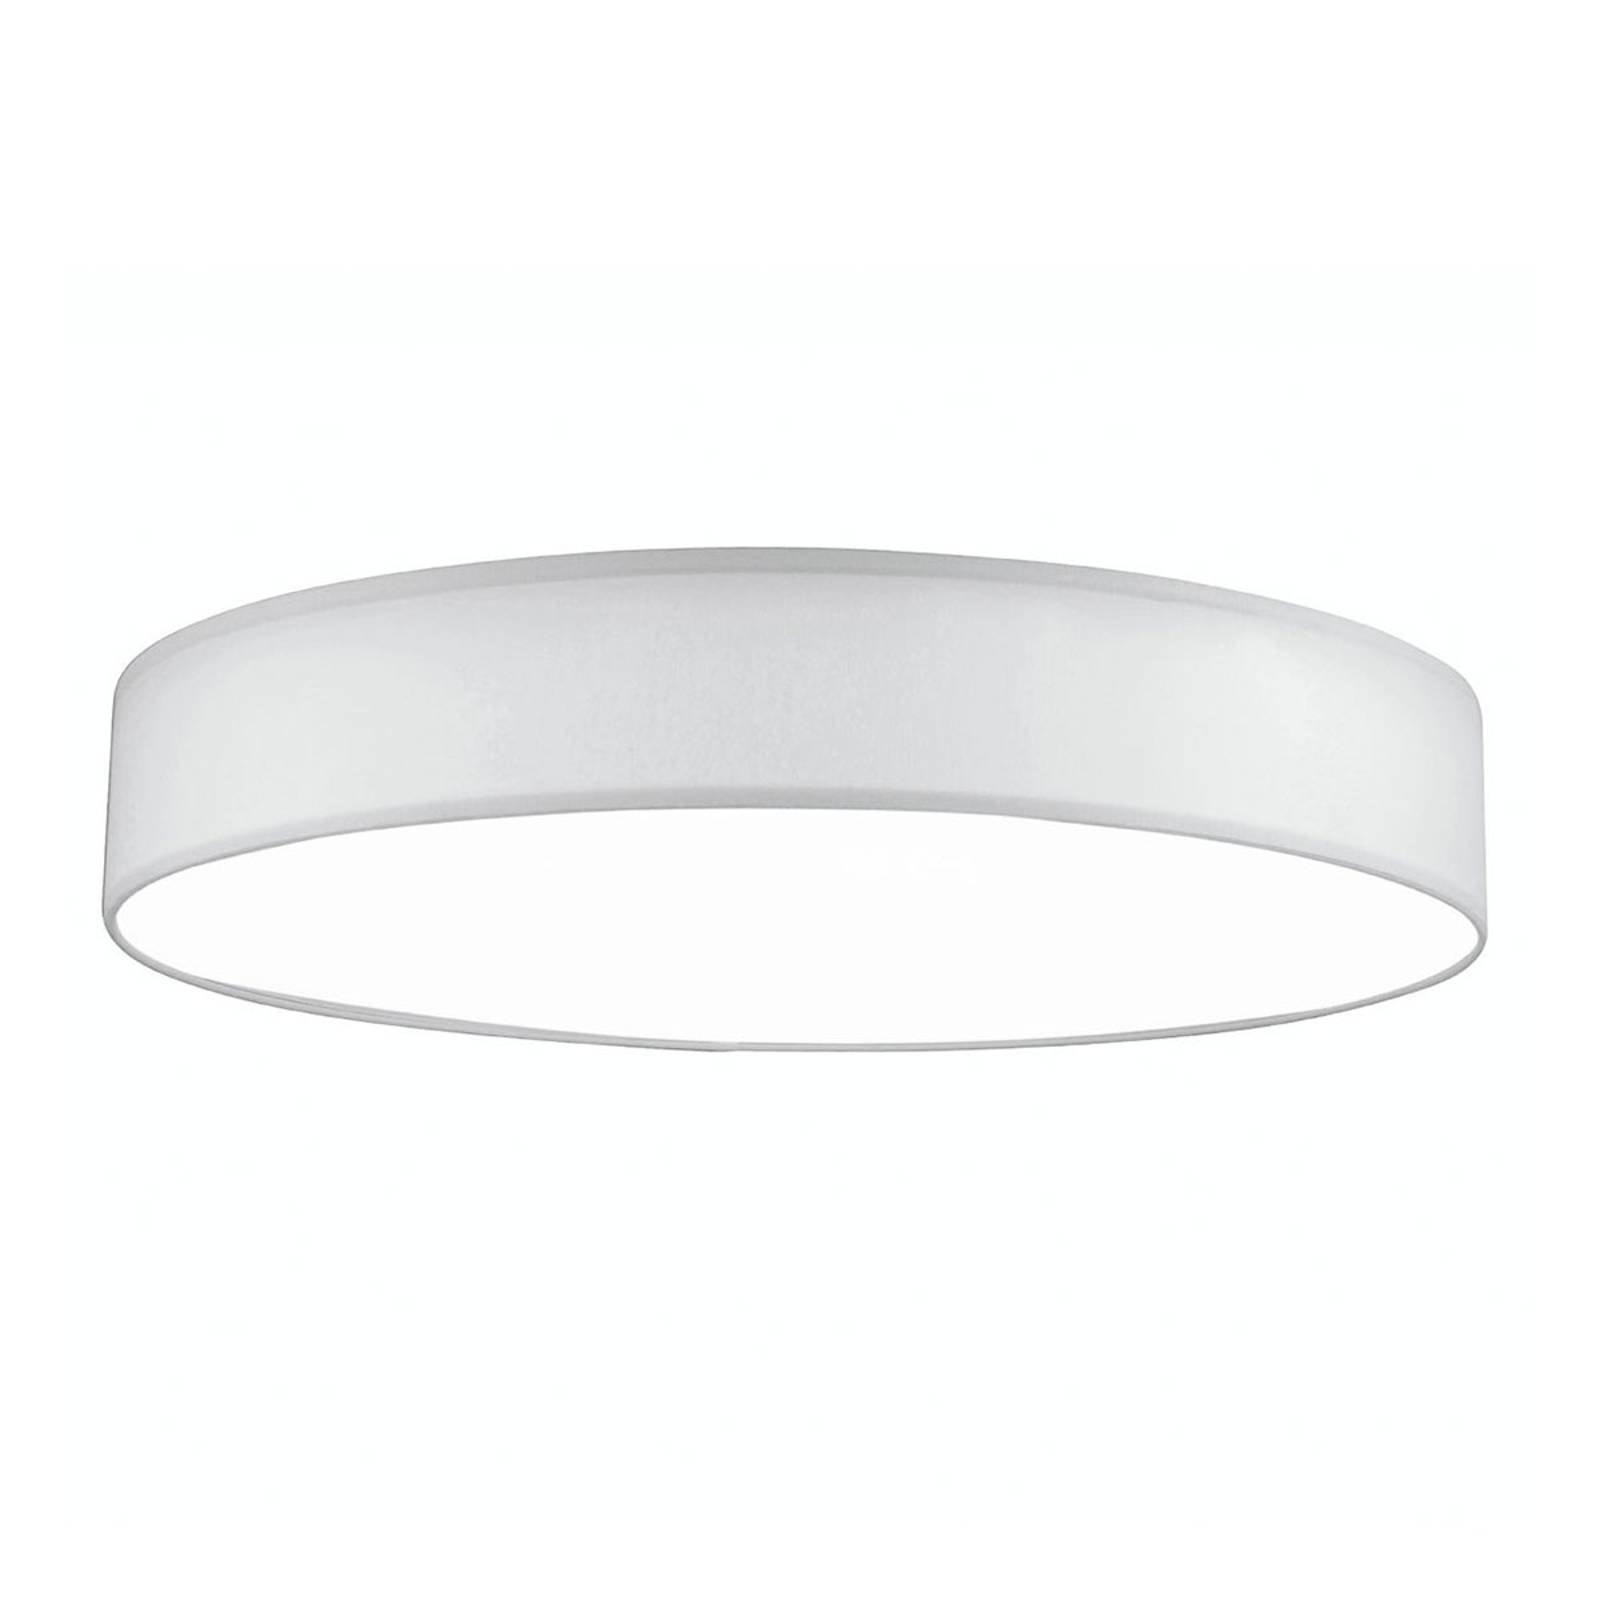 LED-taklampe Luno XL, 3 000 K, 60 W, hvit